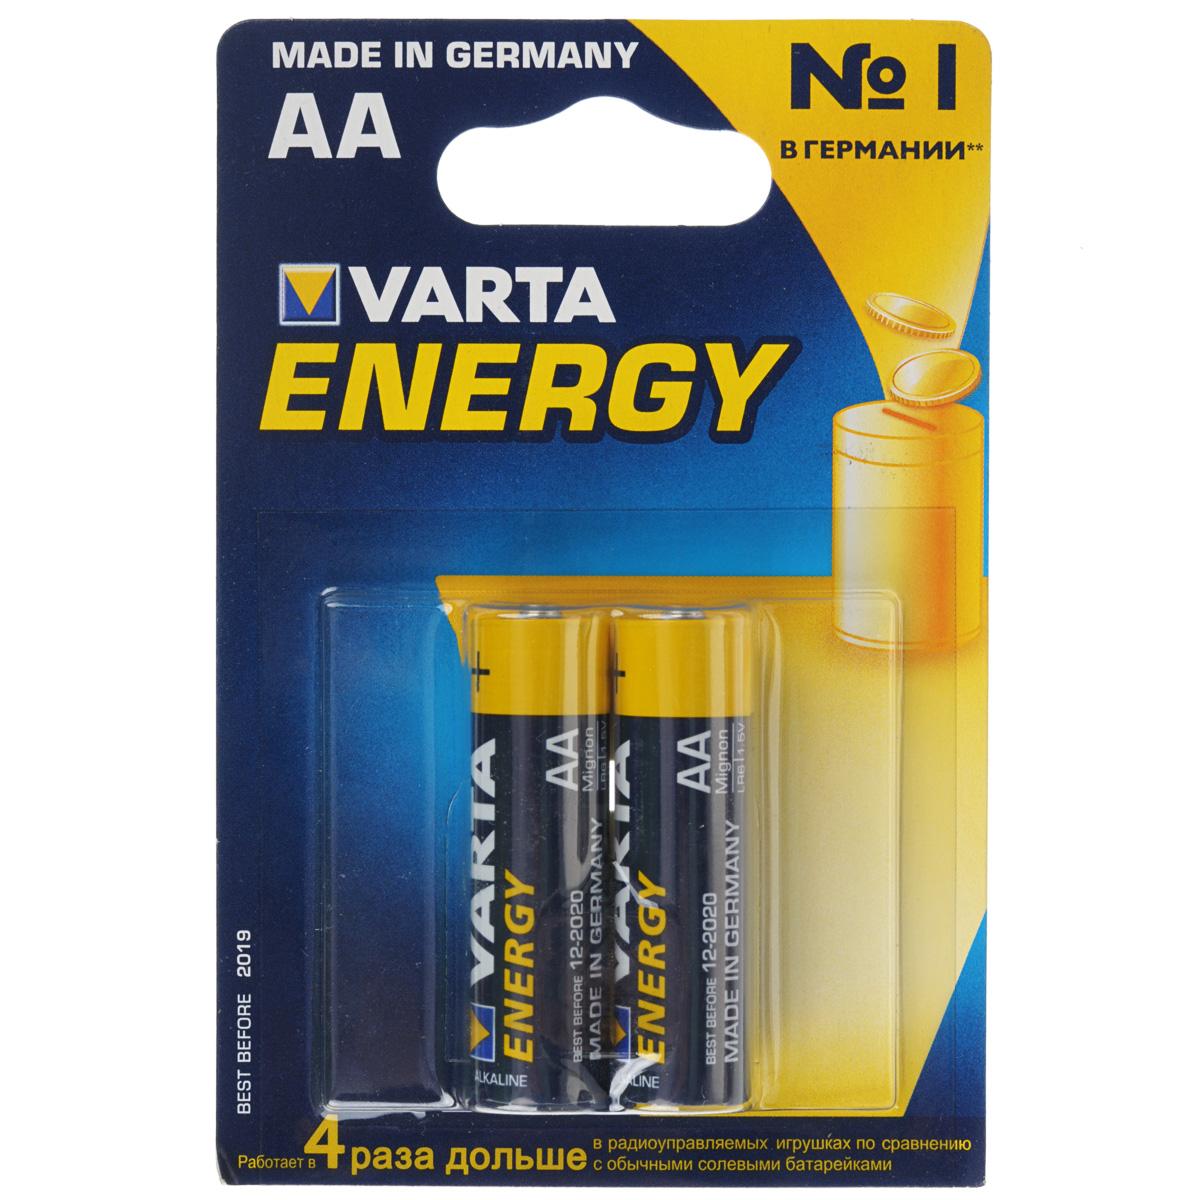 Батарейка Varta Energy, тип АА, 1,5В, 2 шт батарейка varta energy aa блистер 4шт